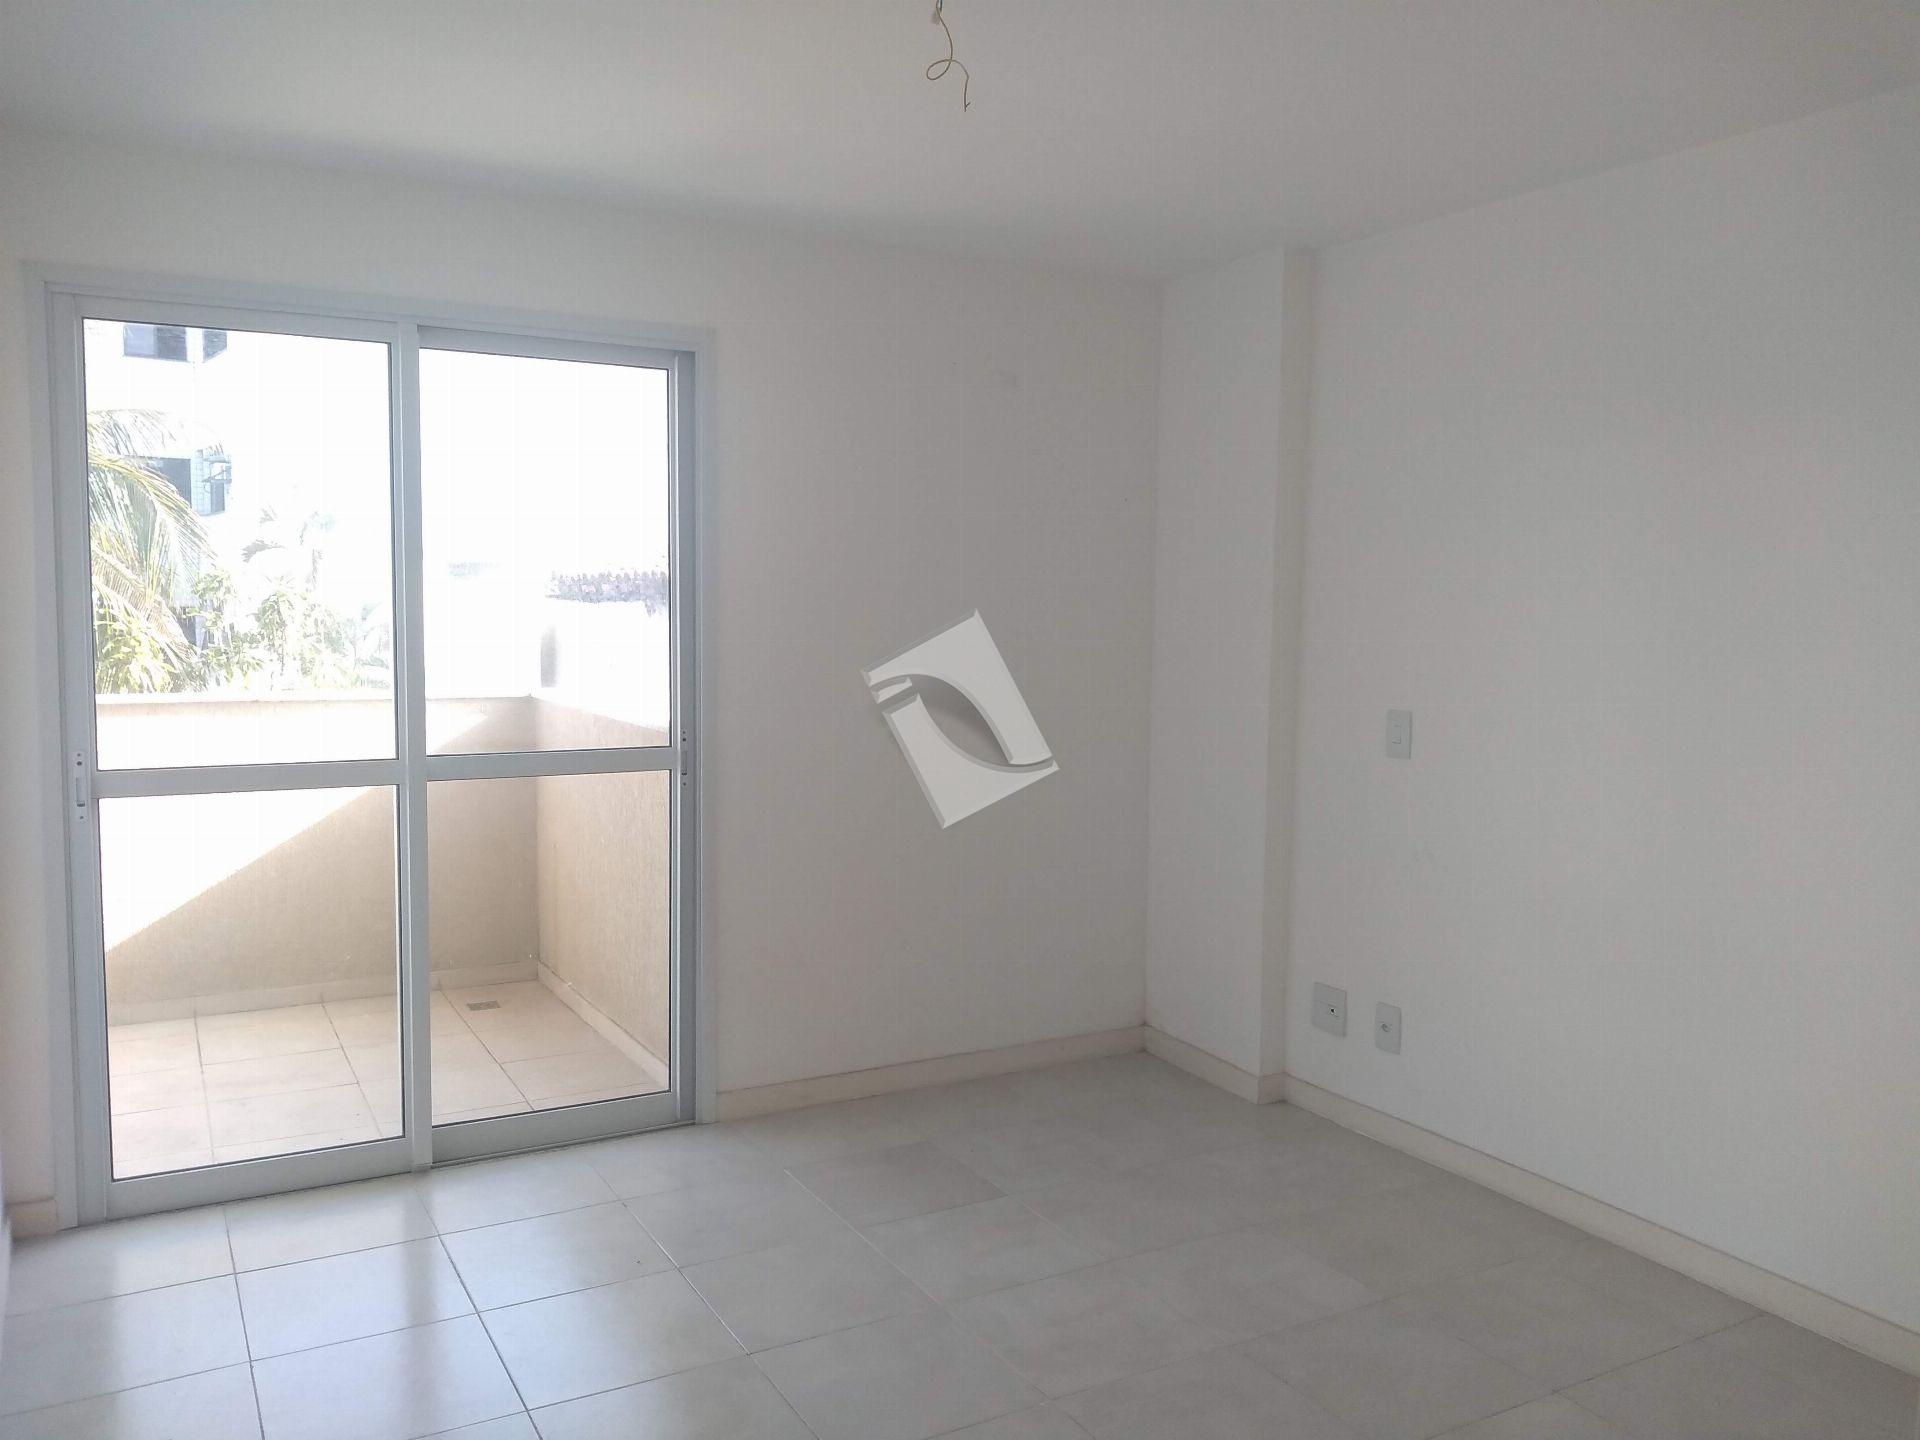 Apartamento Para Alugar - Recreio dos Bandeirantes - Rio de Janeiro - RJ - 042C - 6